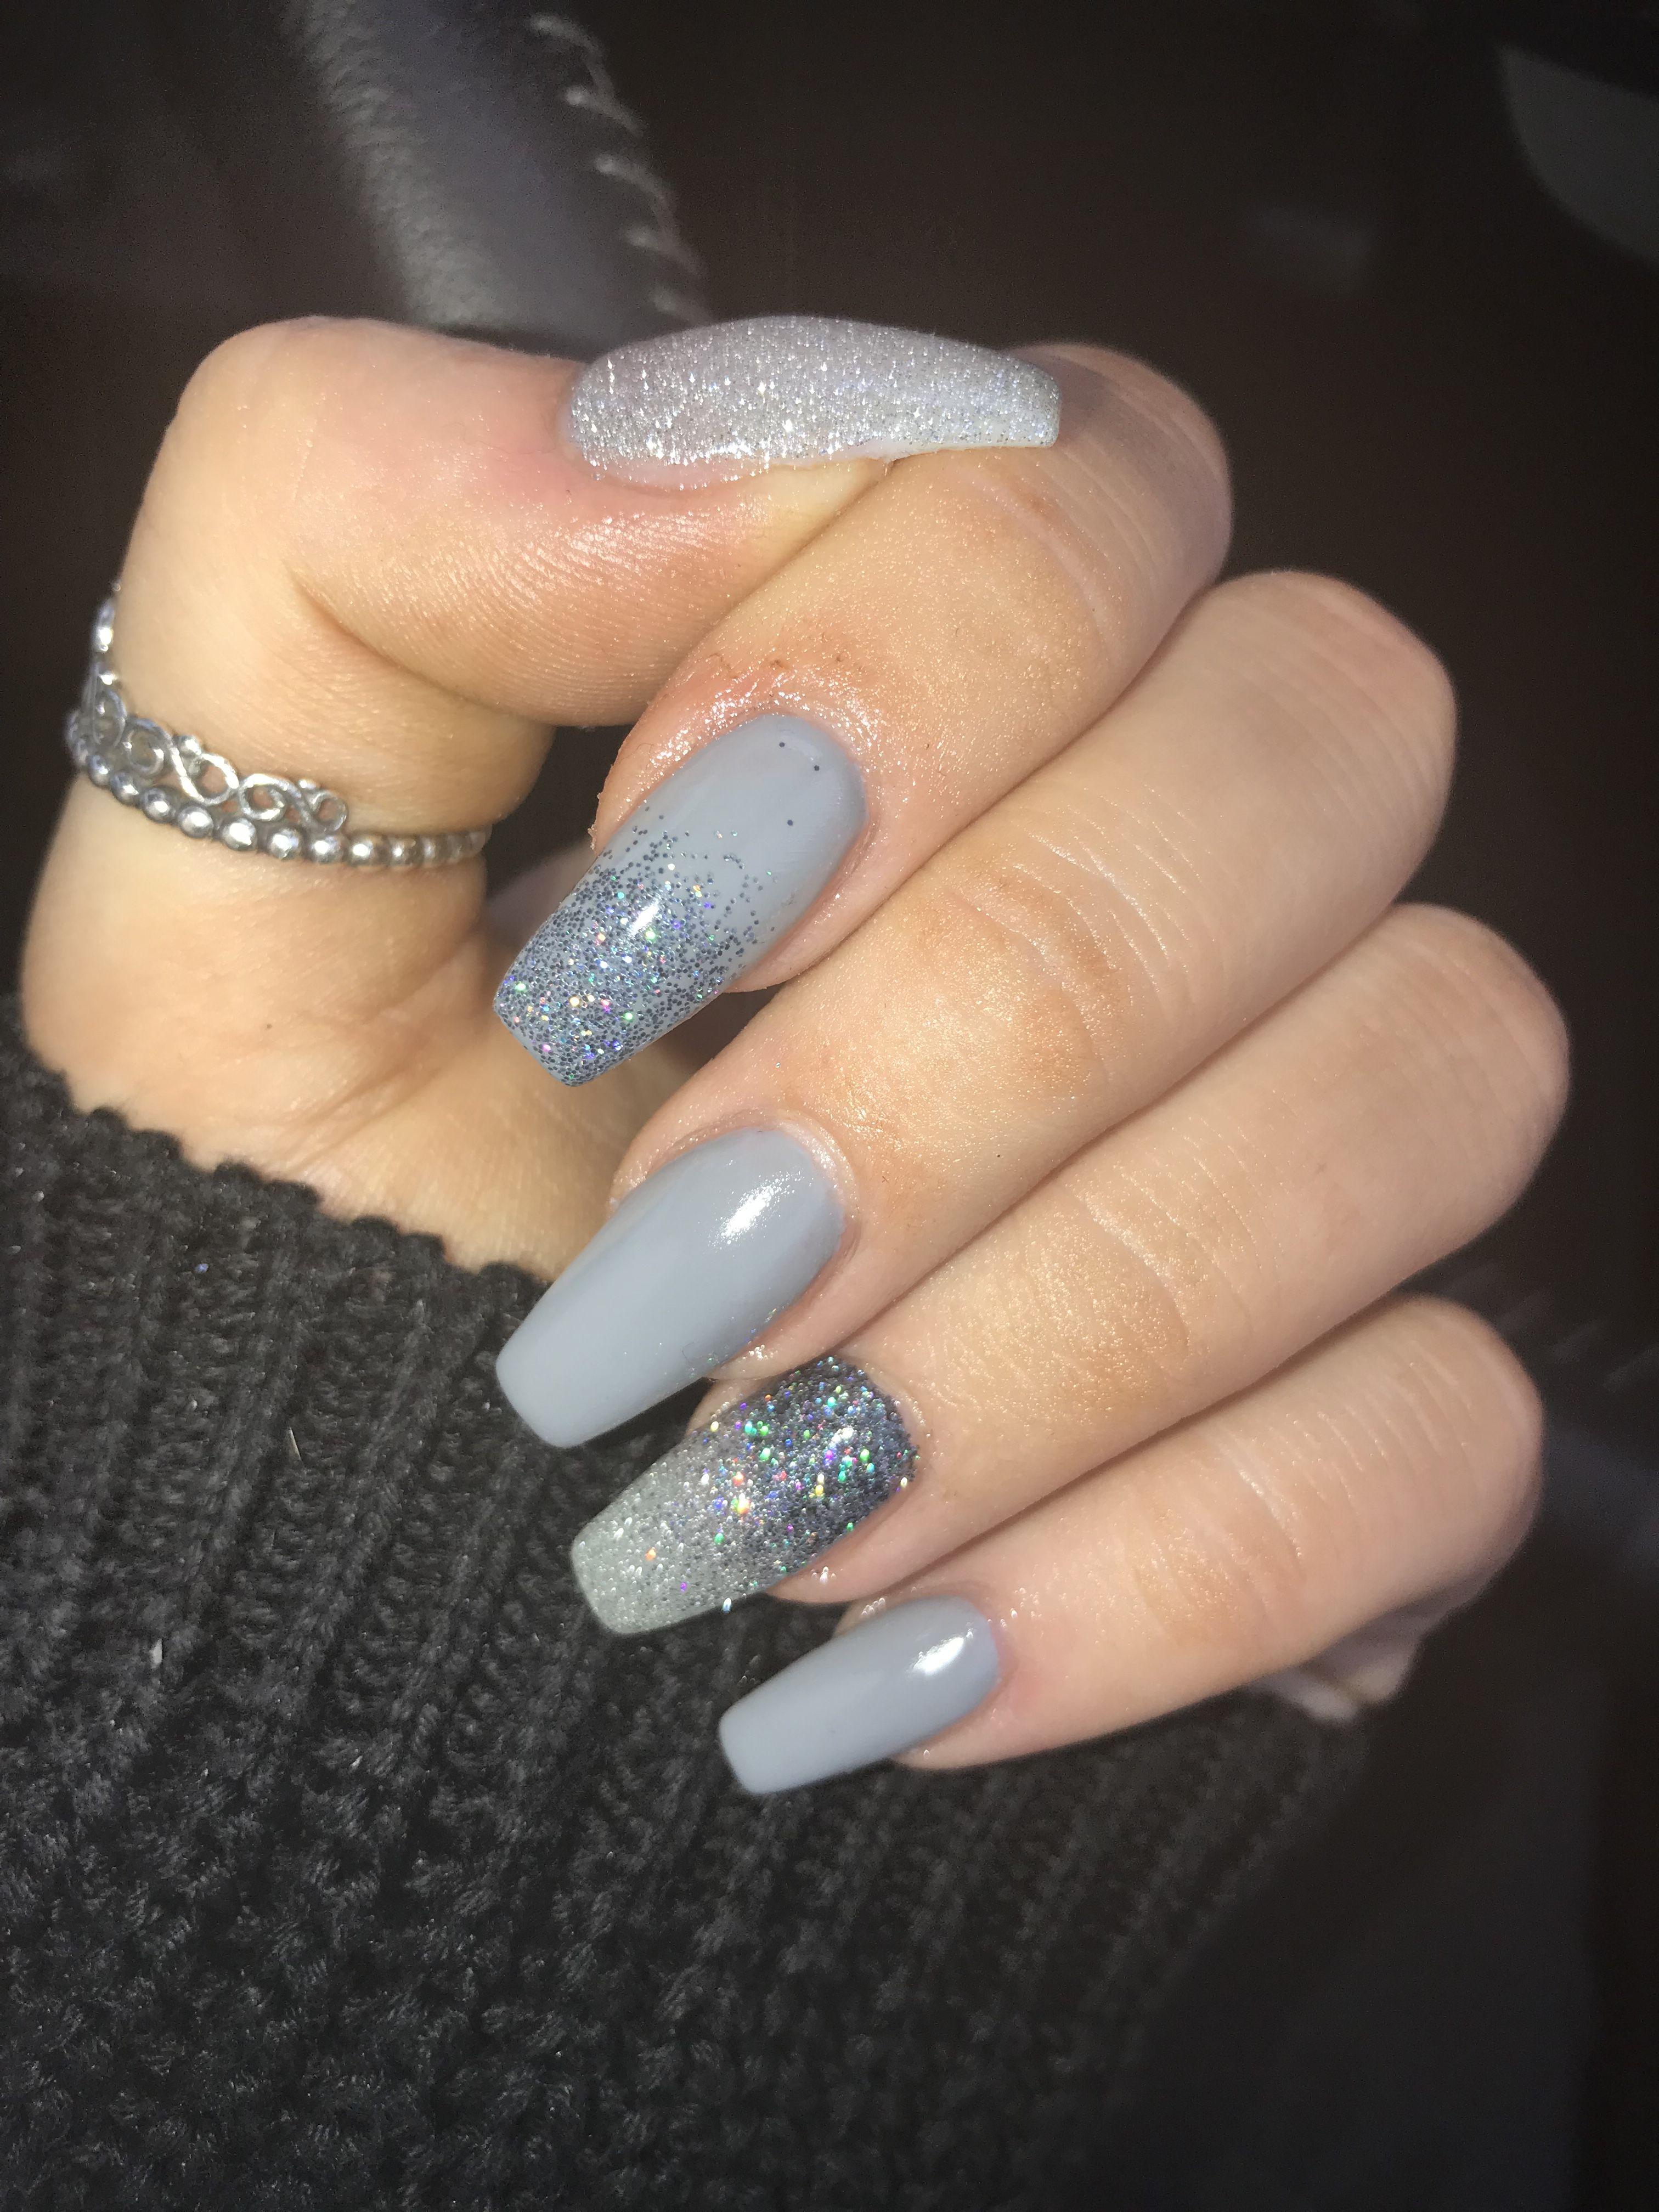 Grey Acrylic Glitter Nails Pink Acrylic Nails Grey Acrylic Nails Glitter Nails Acrylic